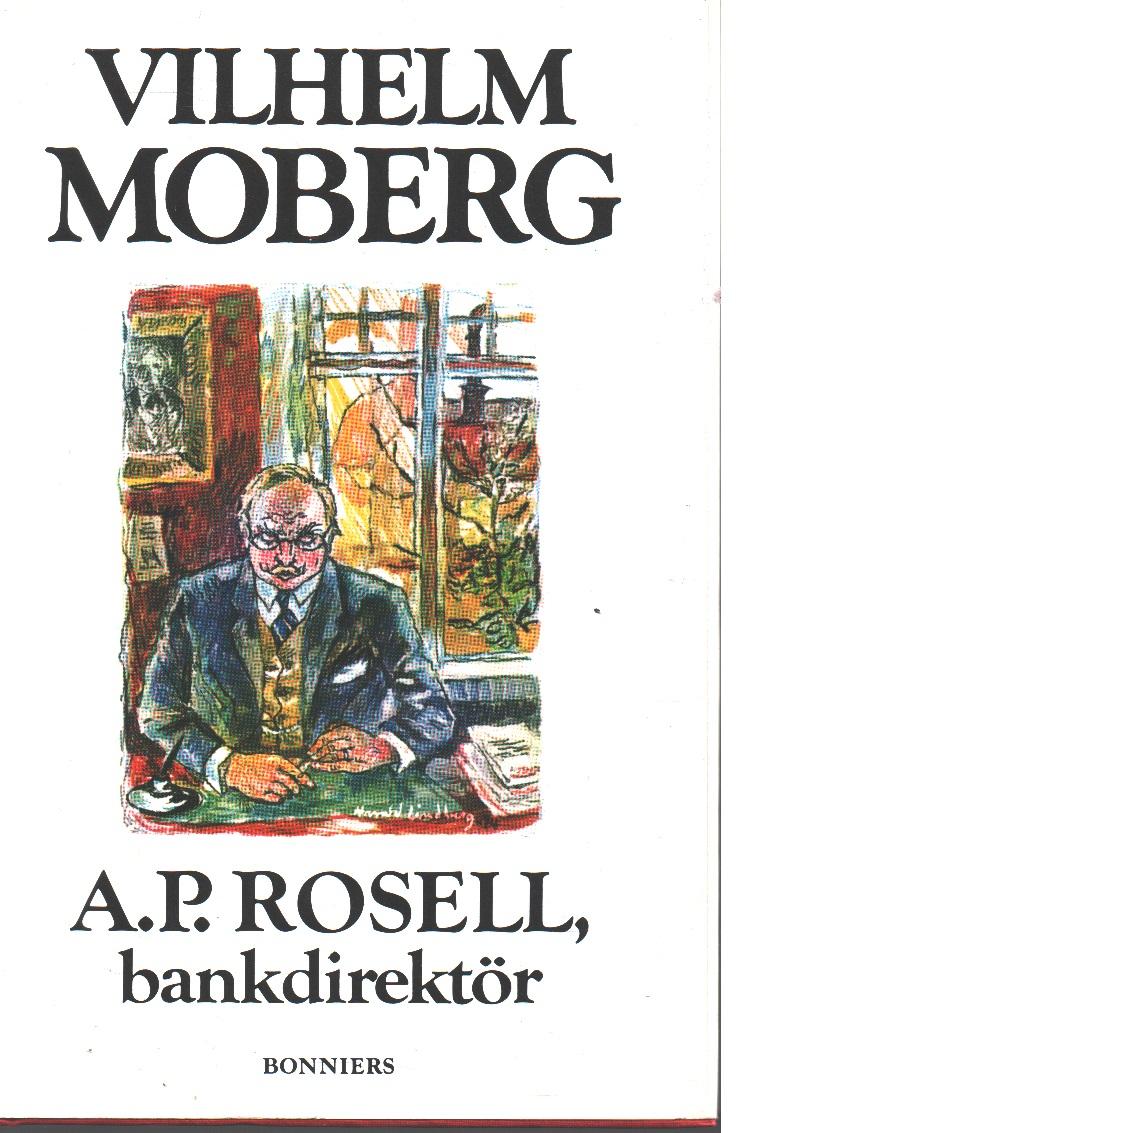 A.P. Rosell, bankdirektör - Moberg, Vilhelm